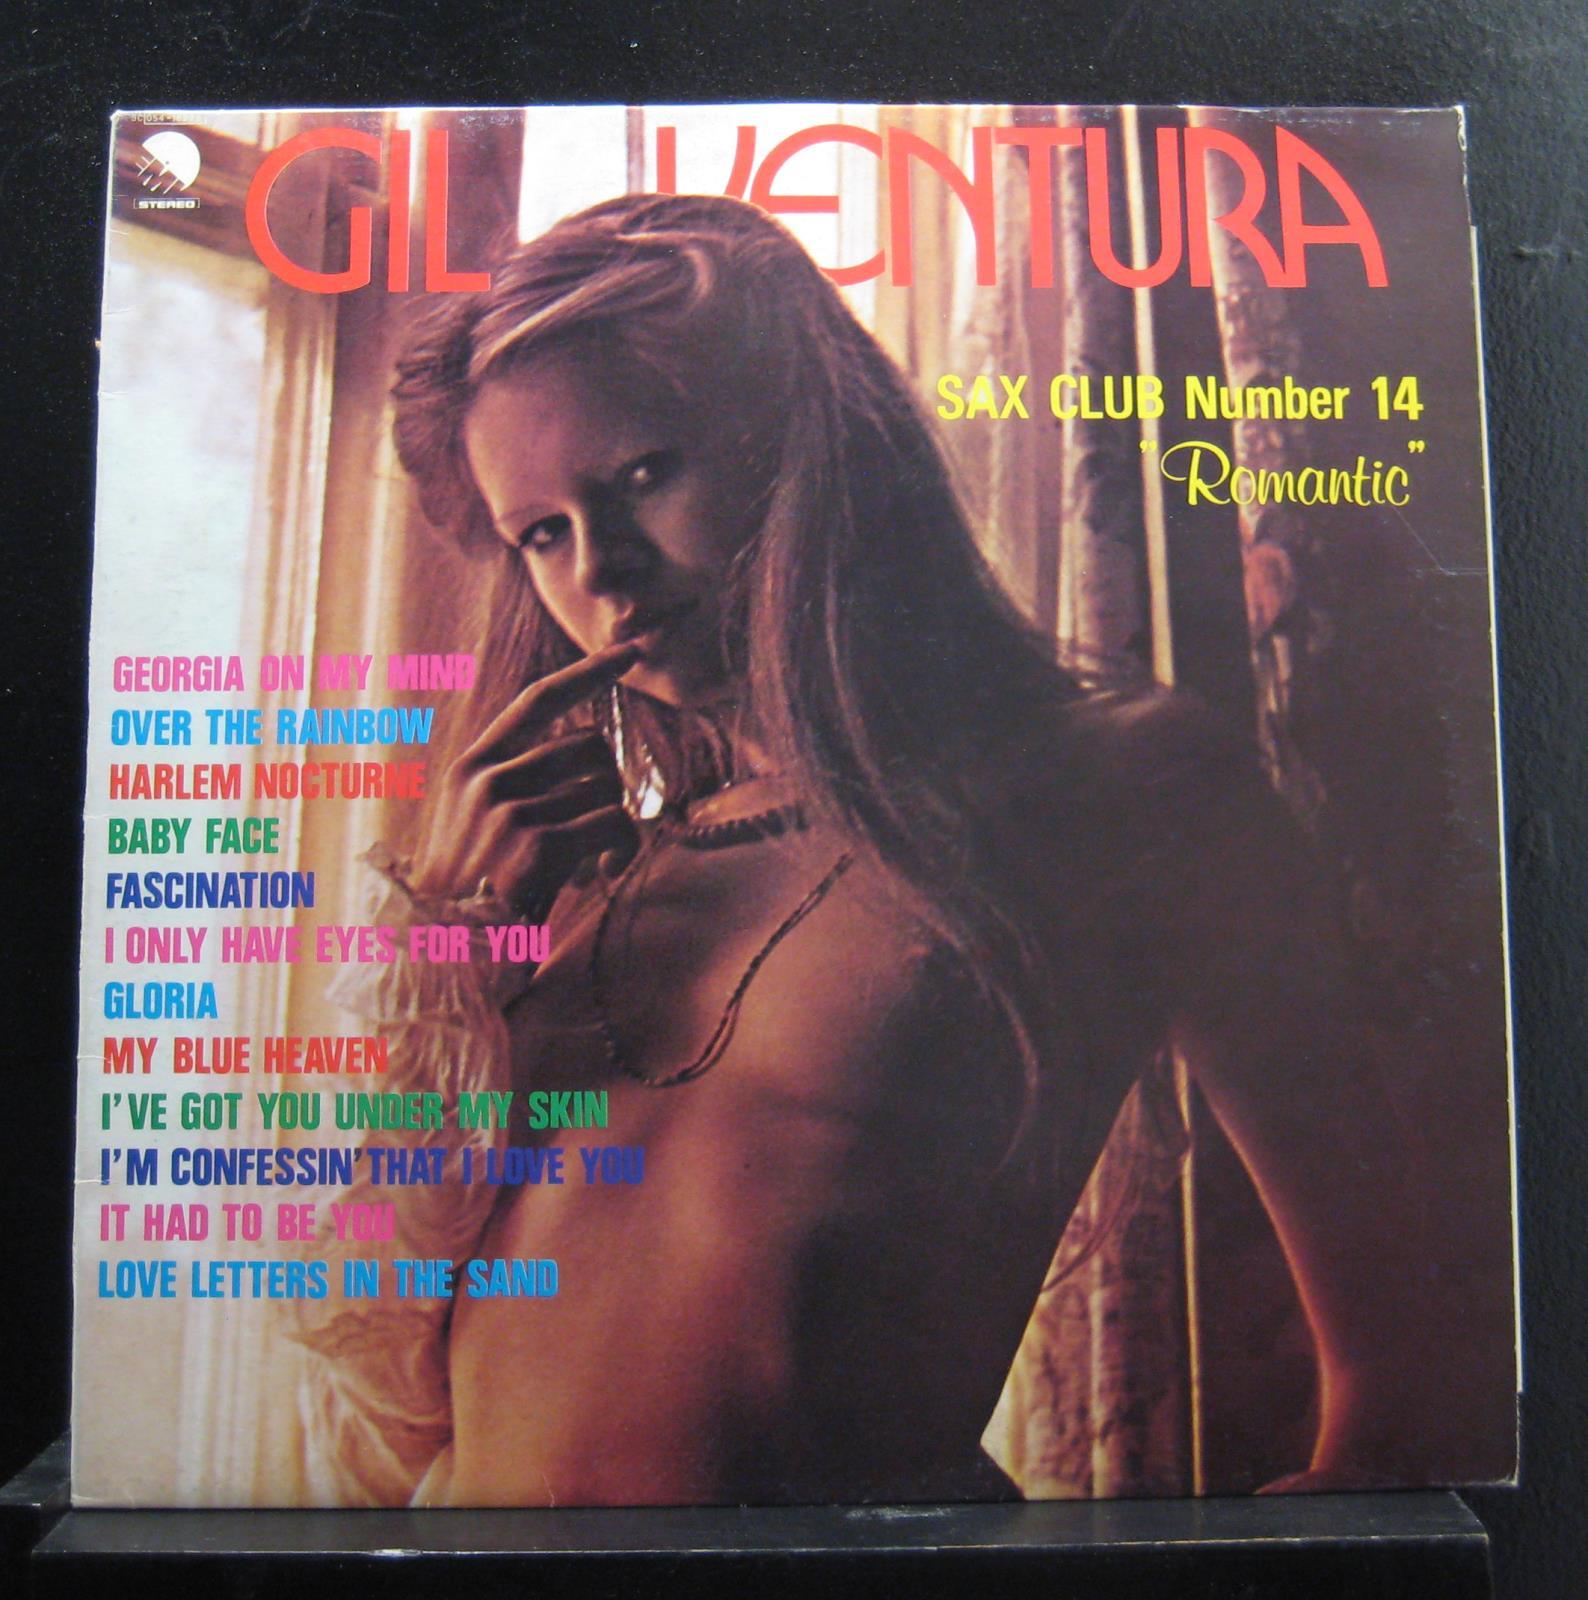 Gil Ventura Sax Club Number 14 Romantic